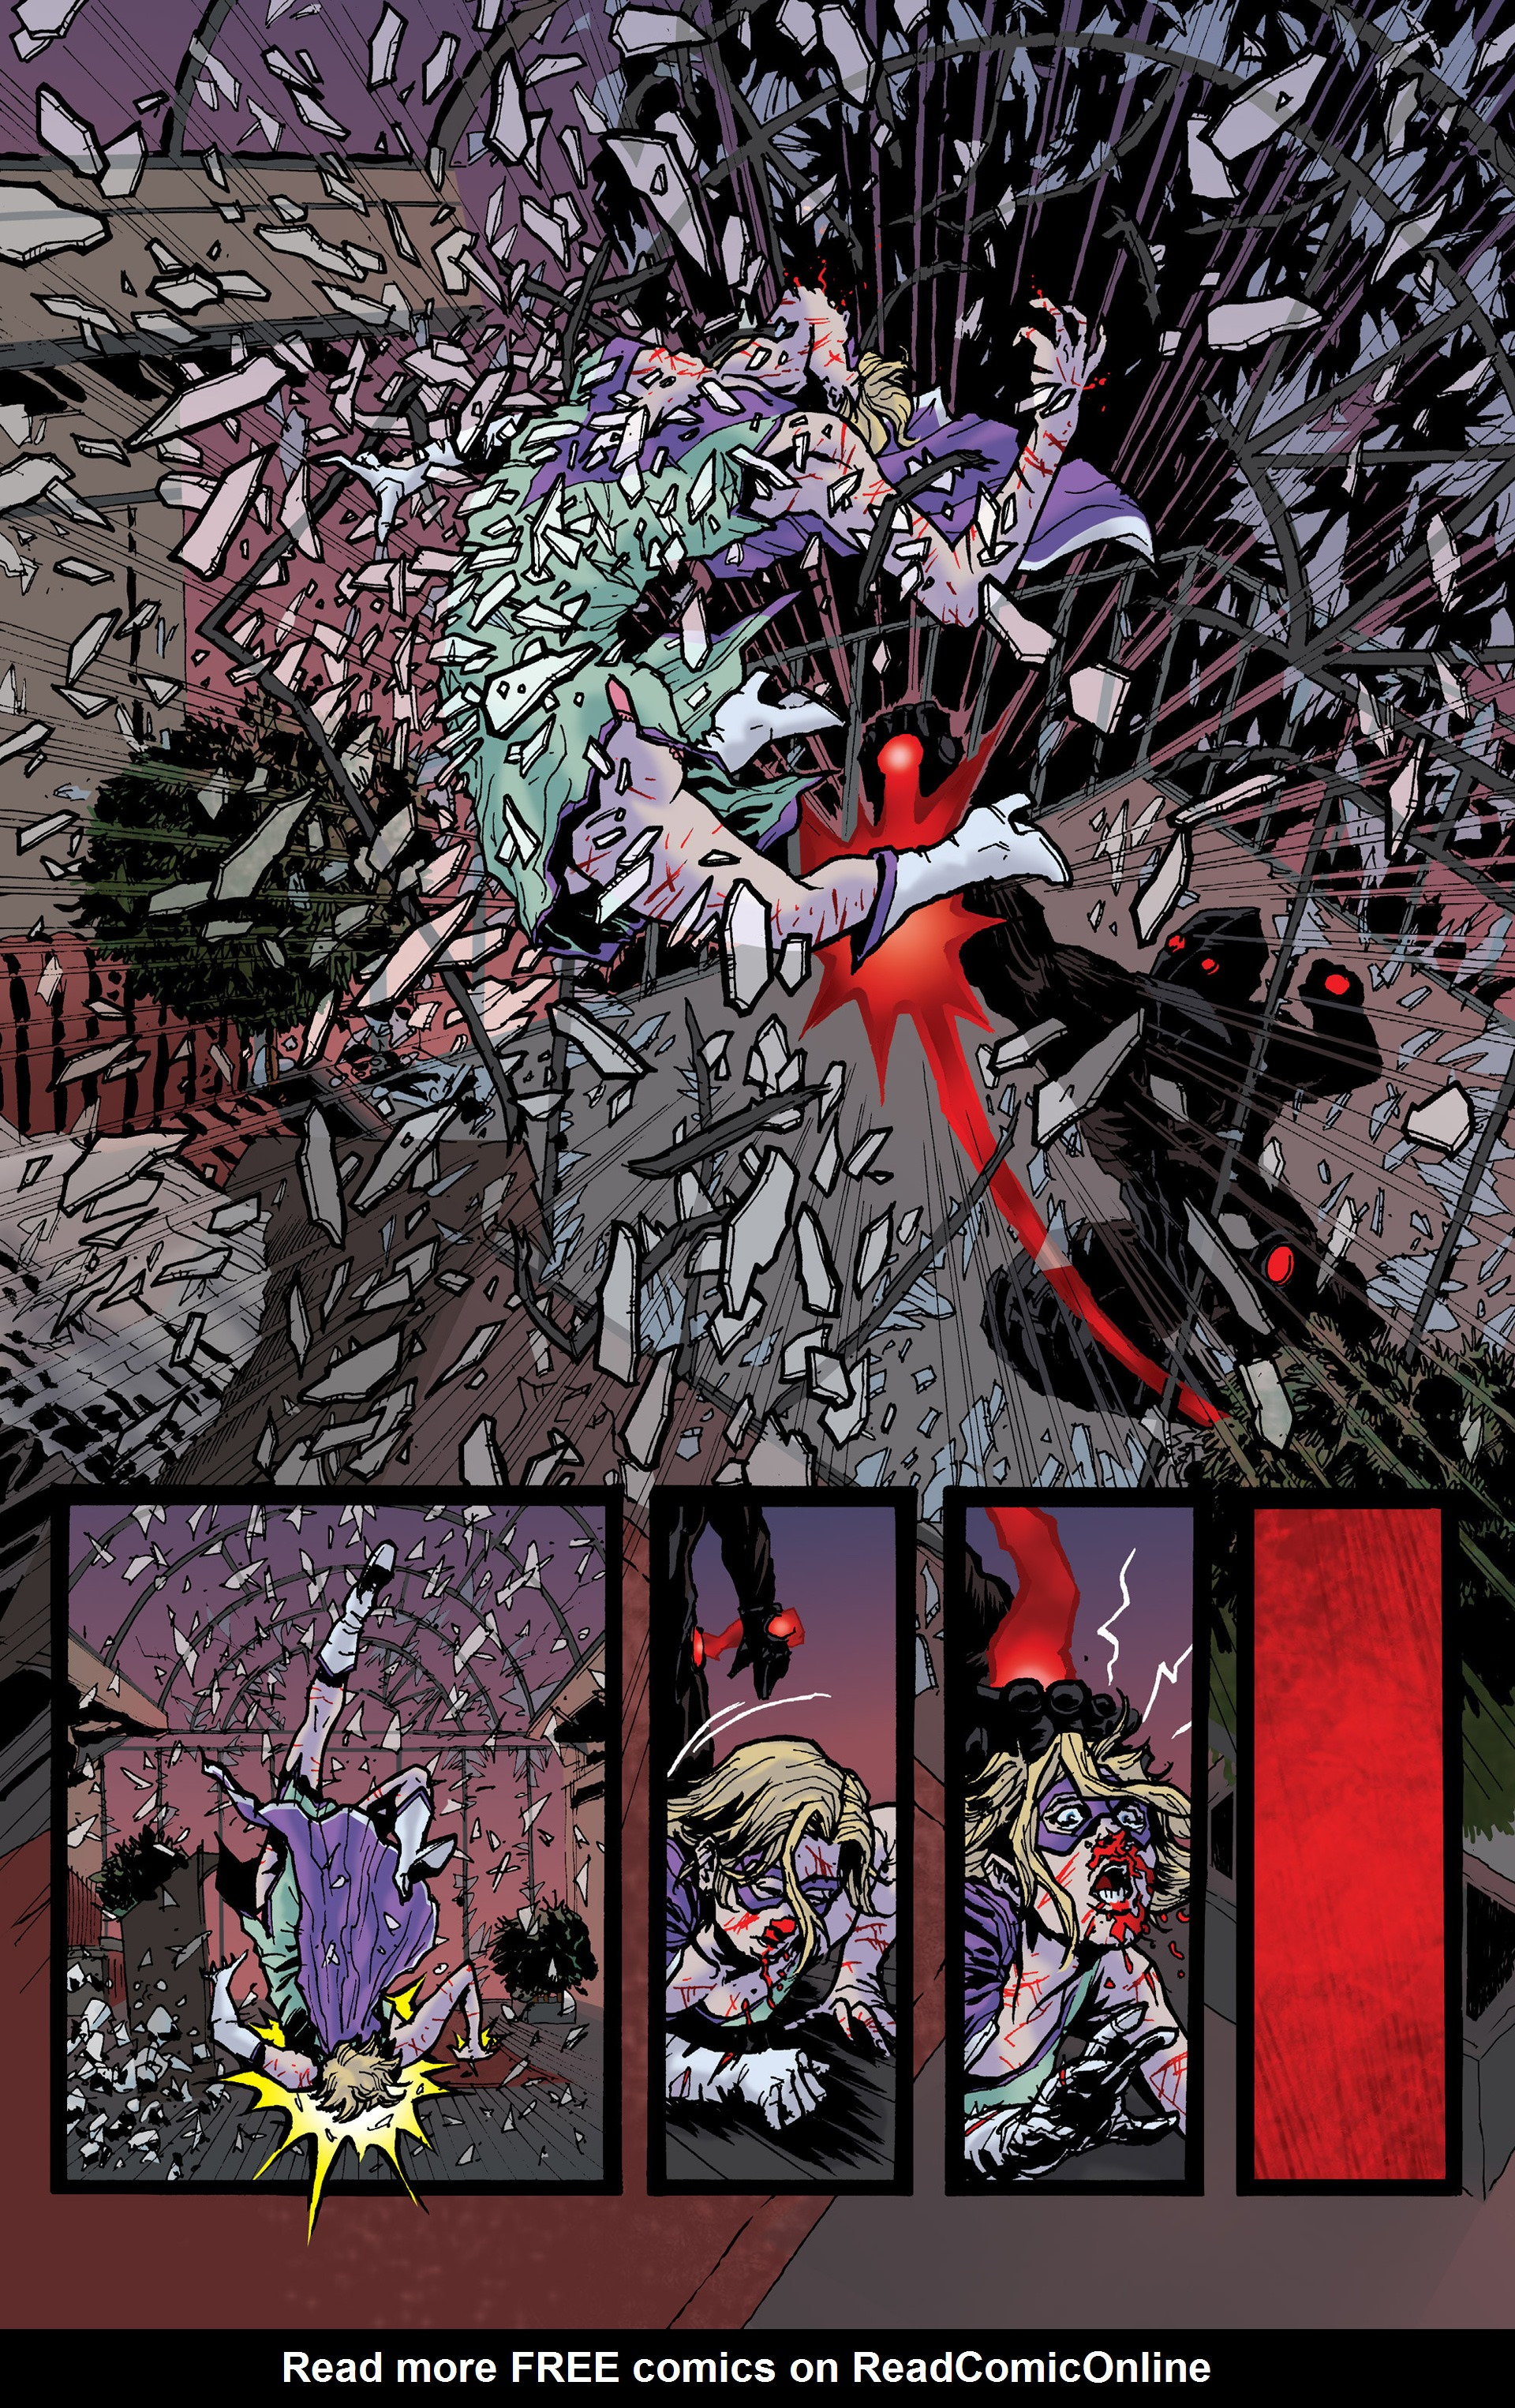 Read online Birth of Venus comic -  Issue #1 - 21